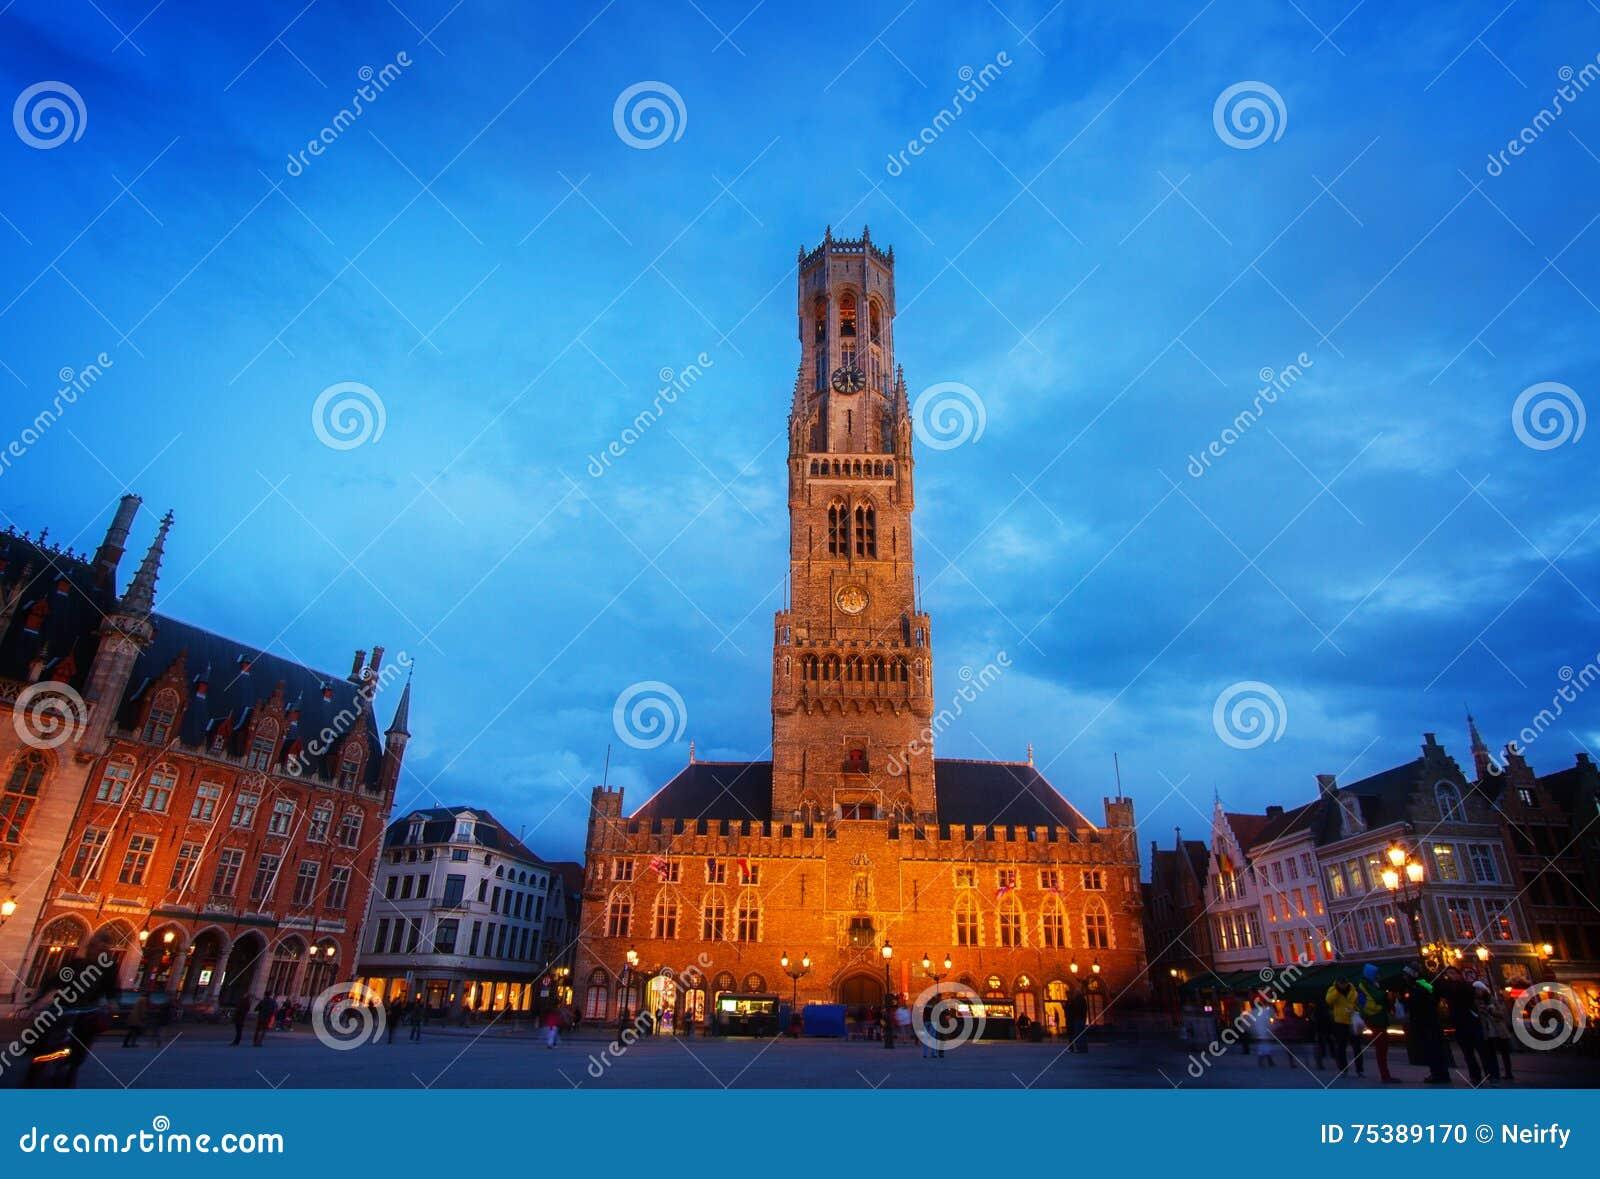 Campanile di Bruges a Grote Markt, Belgio